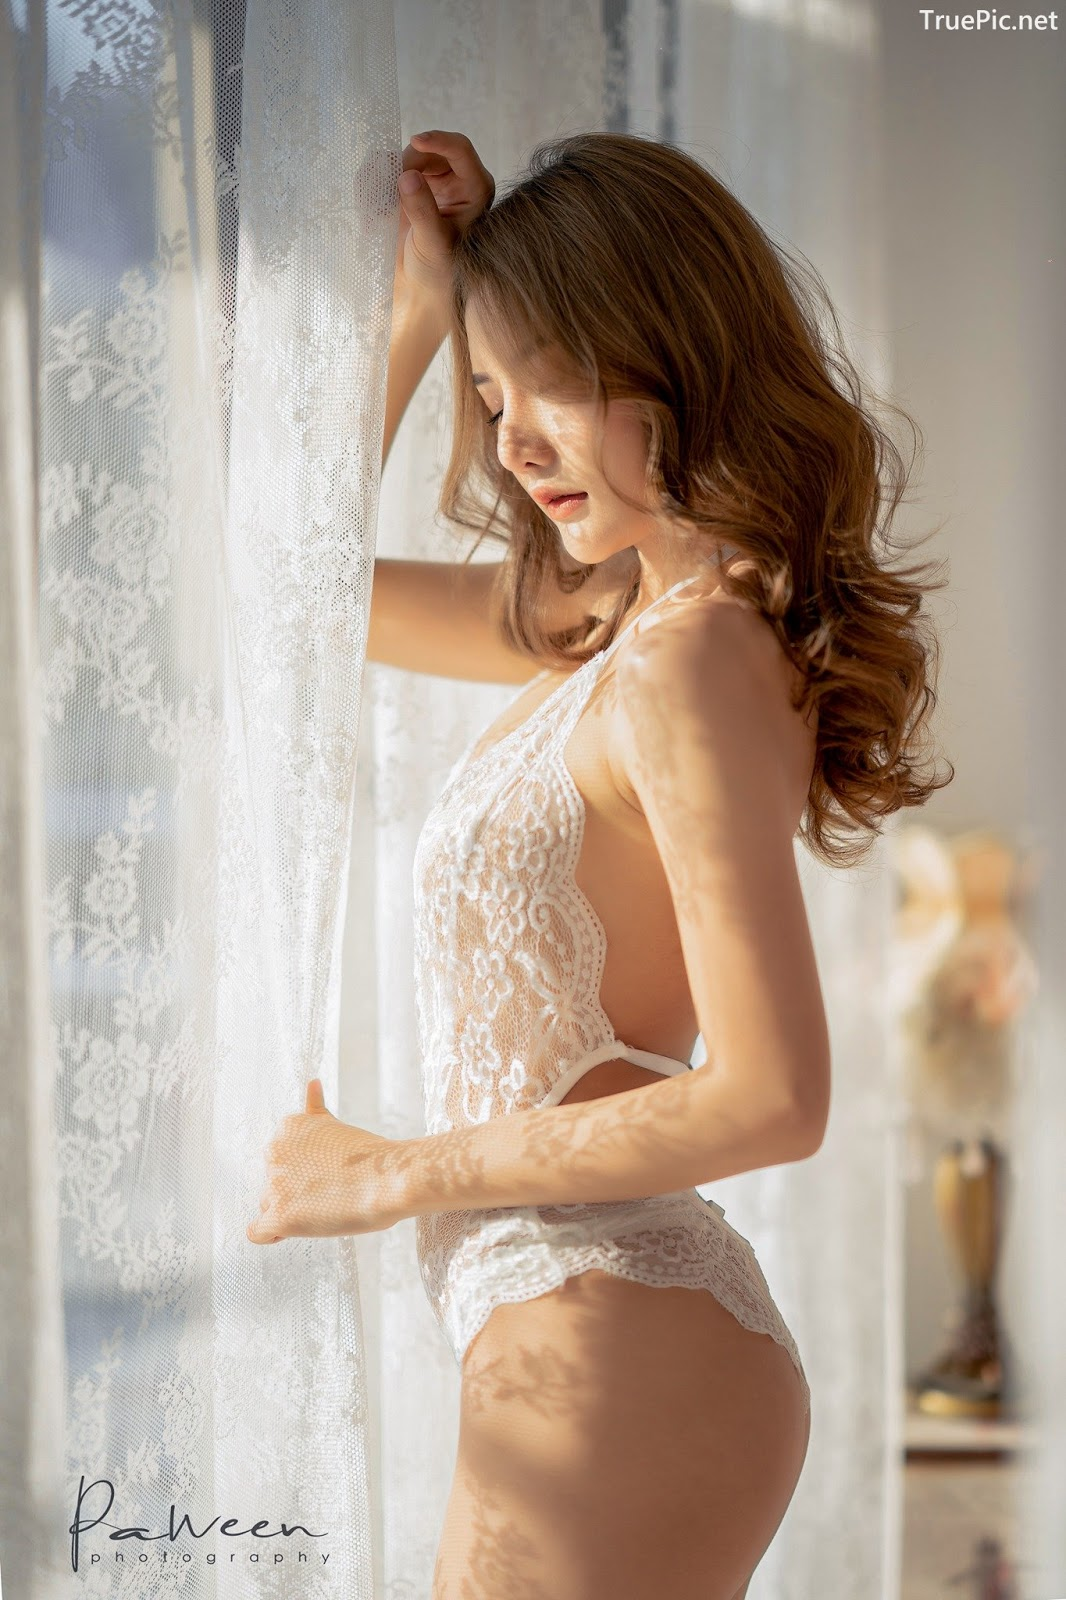 Image Thailand Model - Atittaya Chaiyasing - White Lace Lingerie - TruePic.net - Picture-21